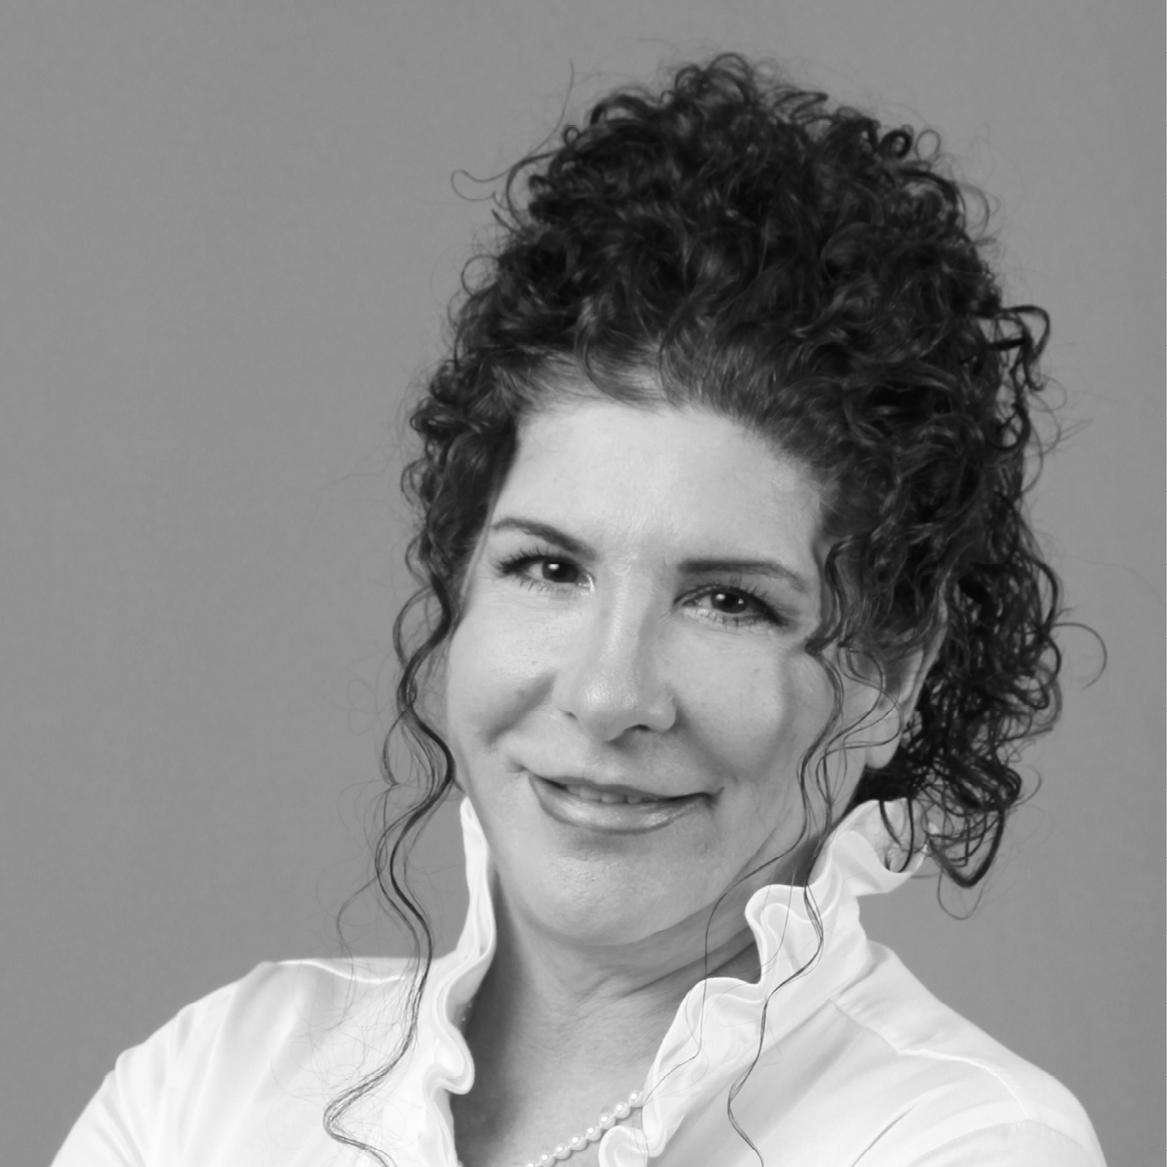 Portrait of Debbie Mauro